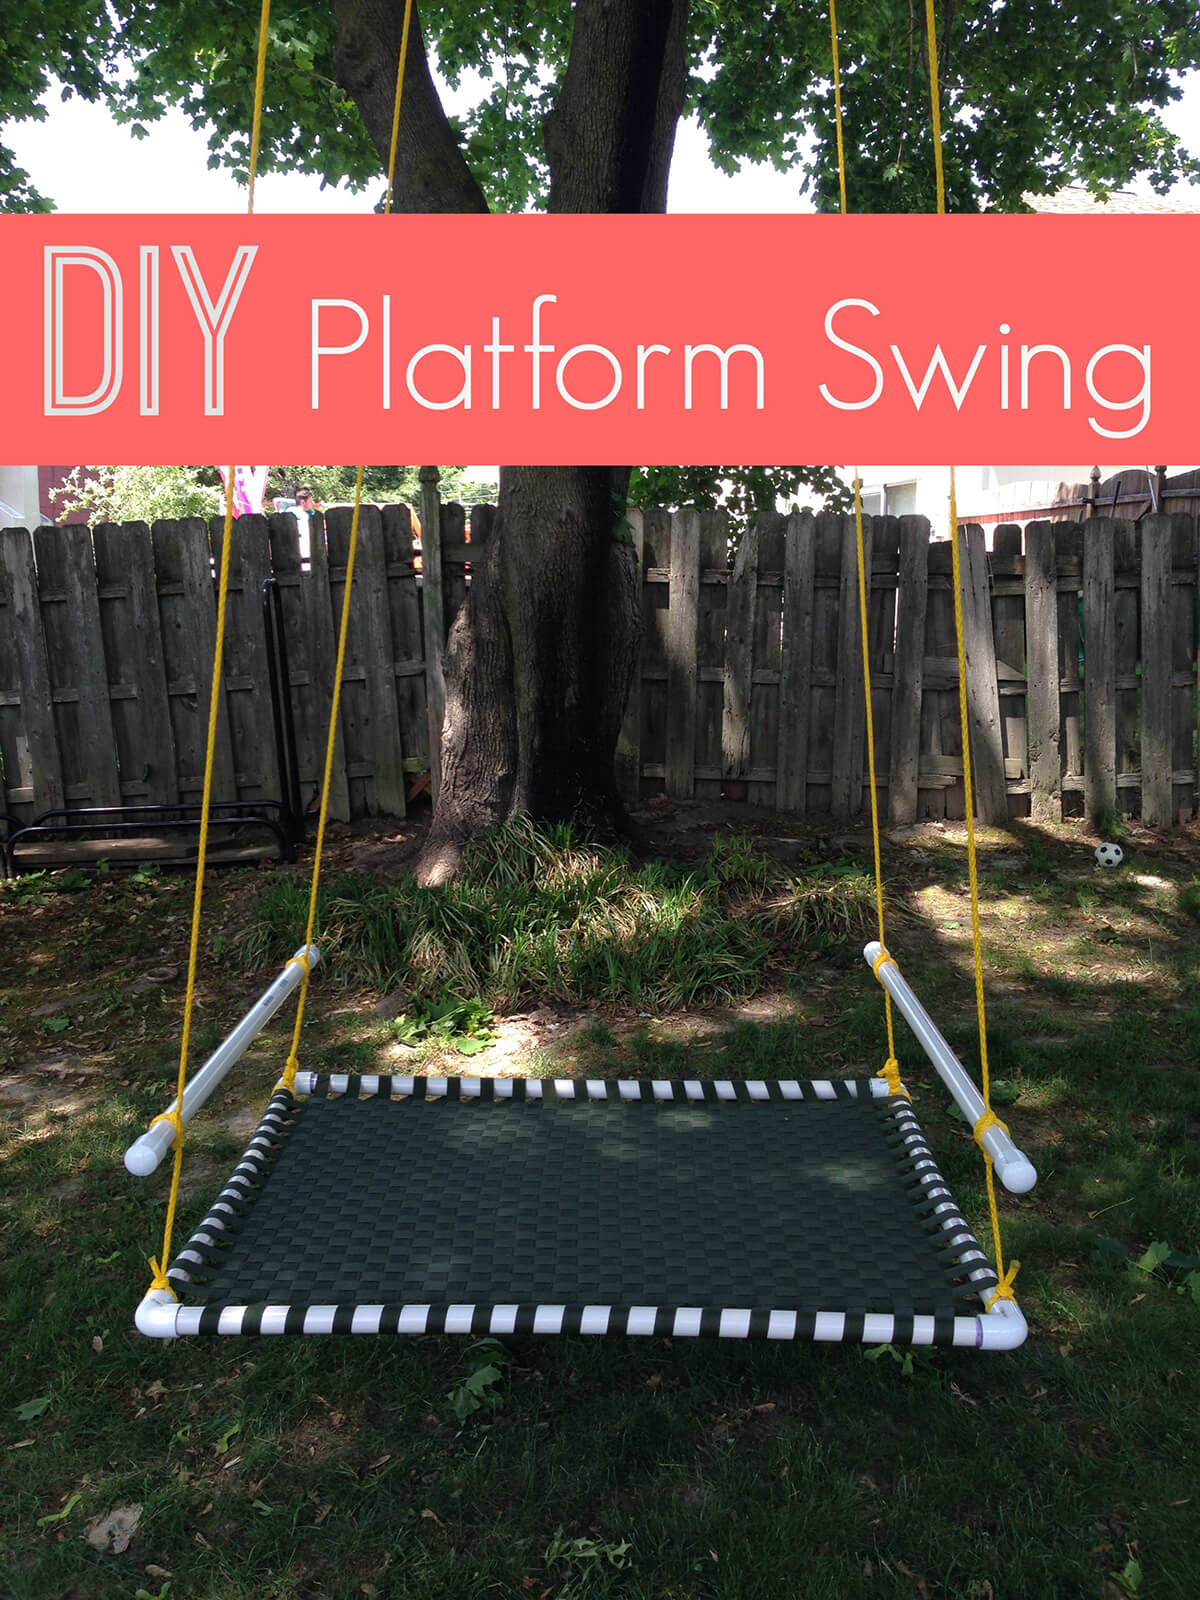 Fun Platform Swing Hanging from a Tree